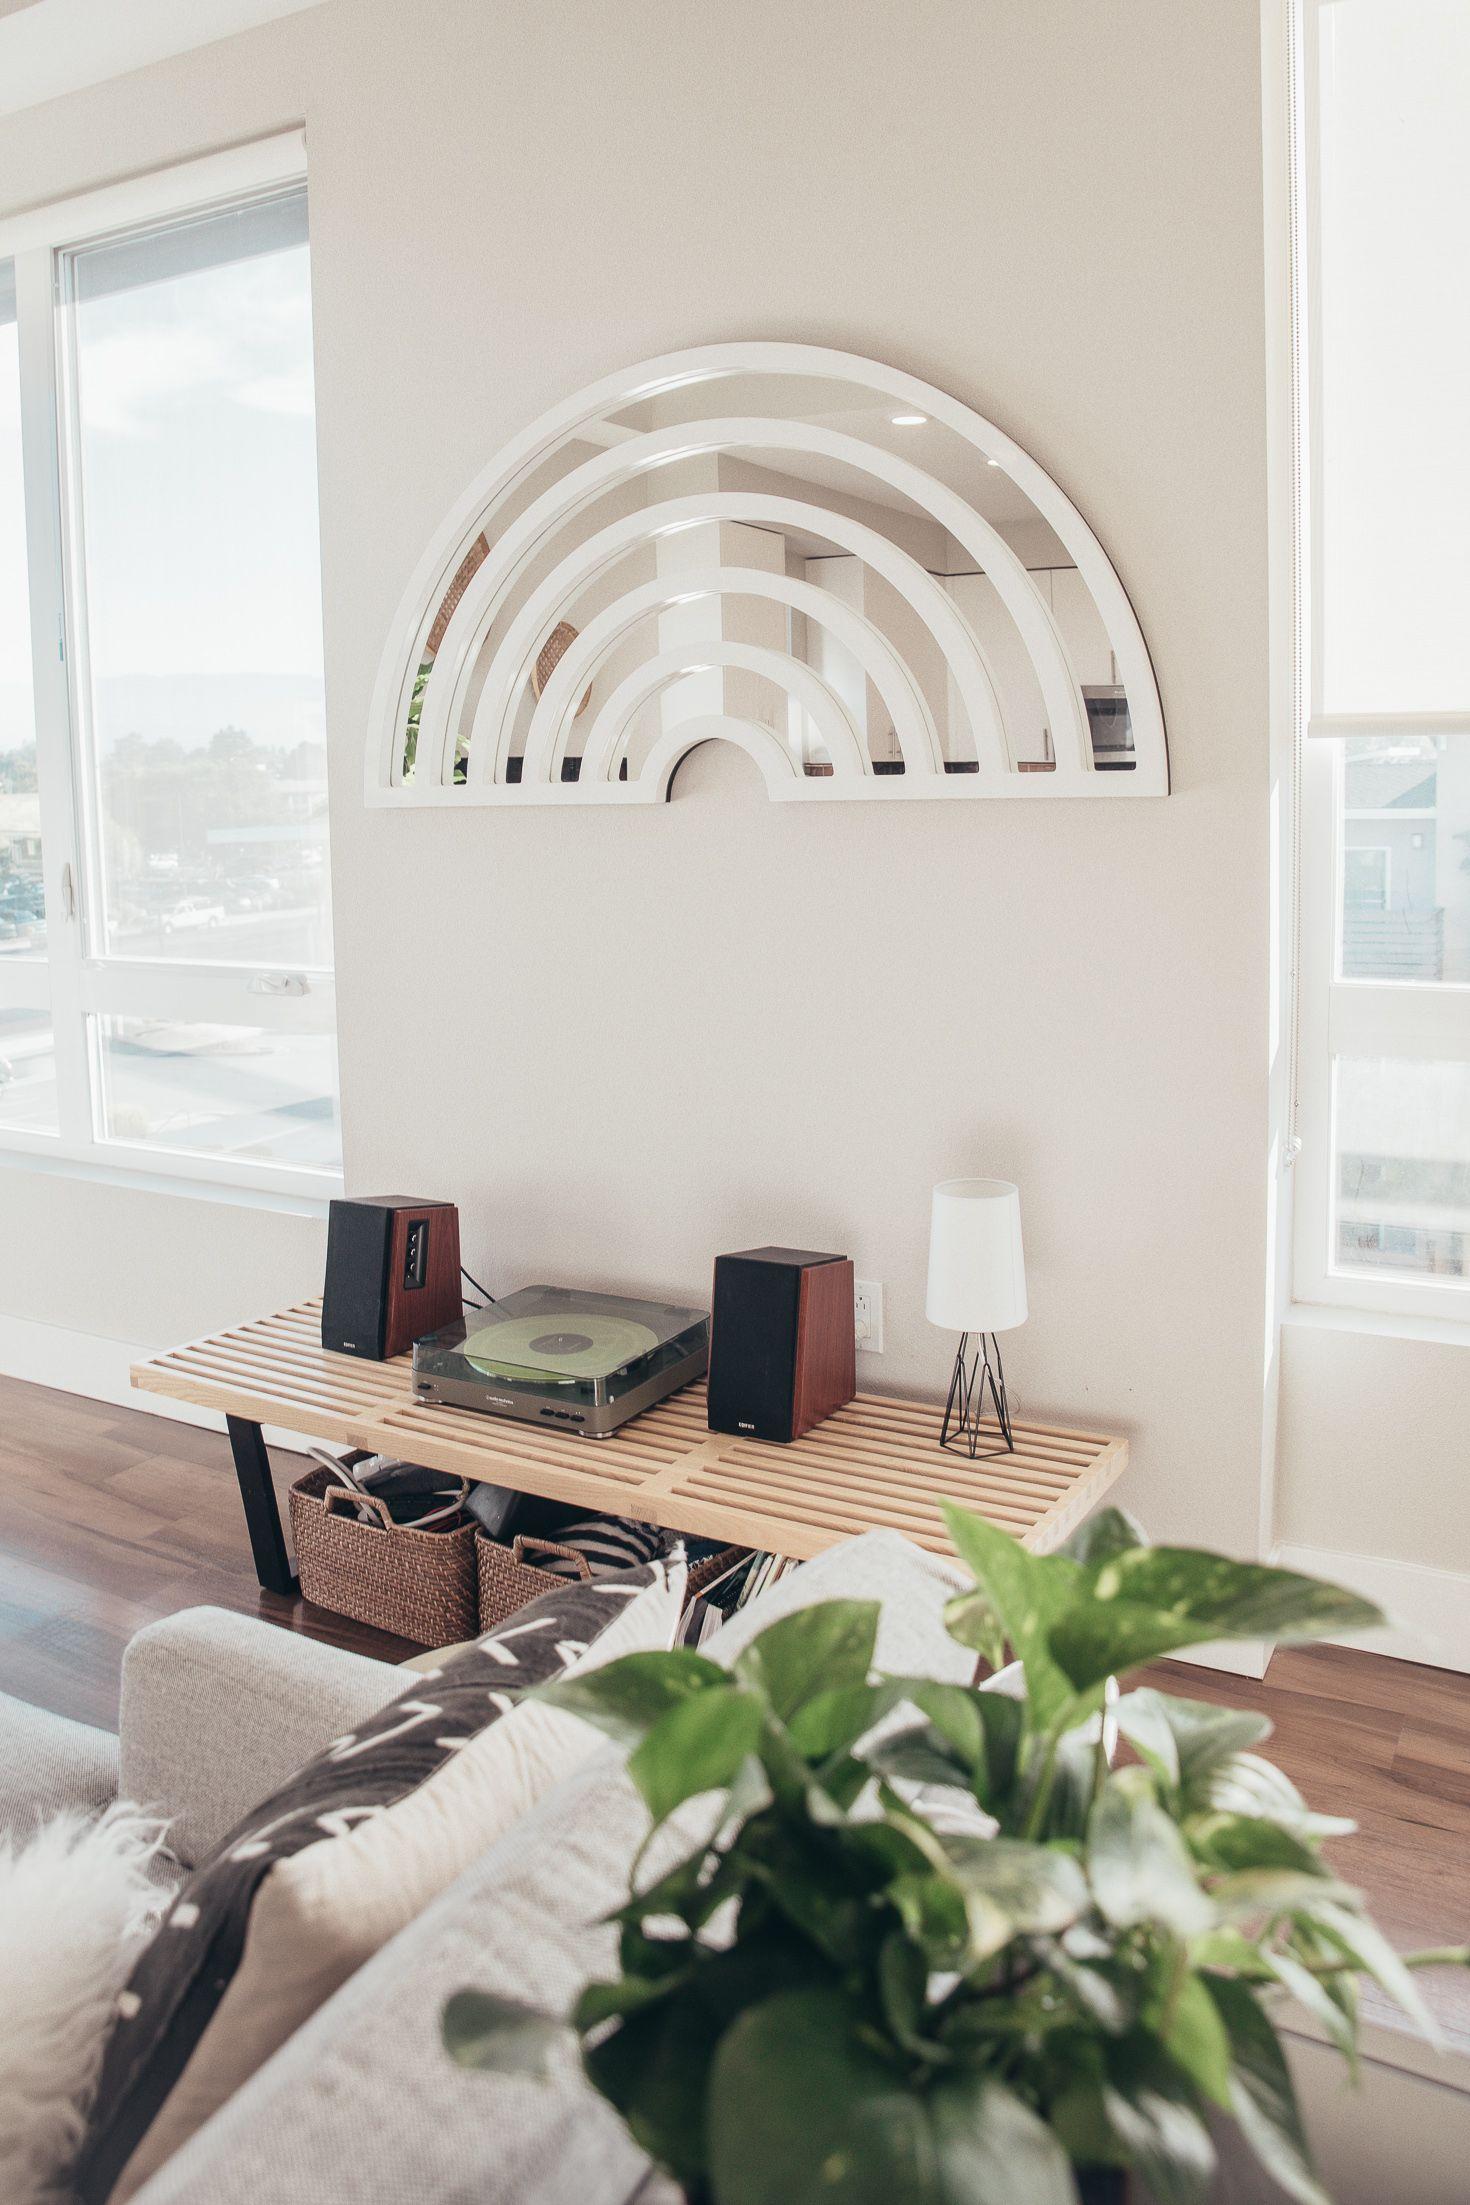 Living Room Home Decor Ideas Miss Louie Apartment Tour Bright Modern Boho